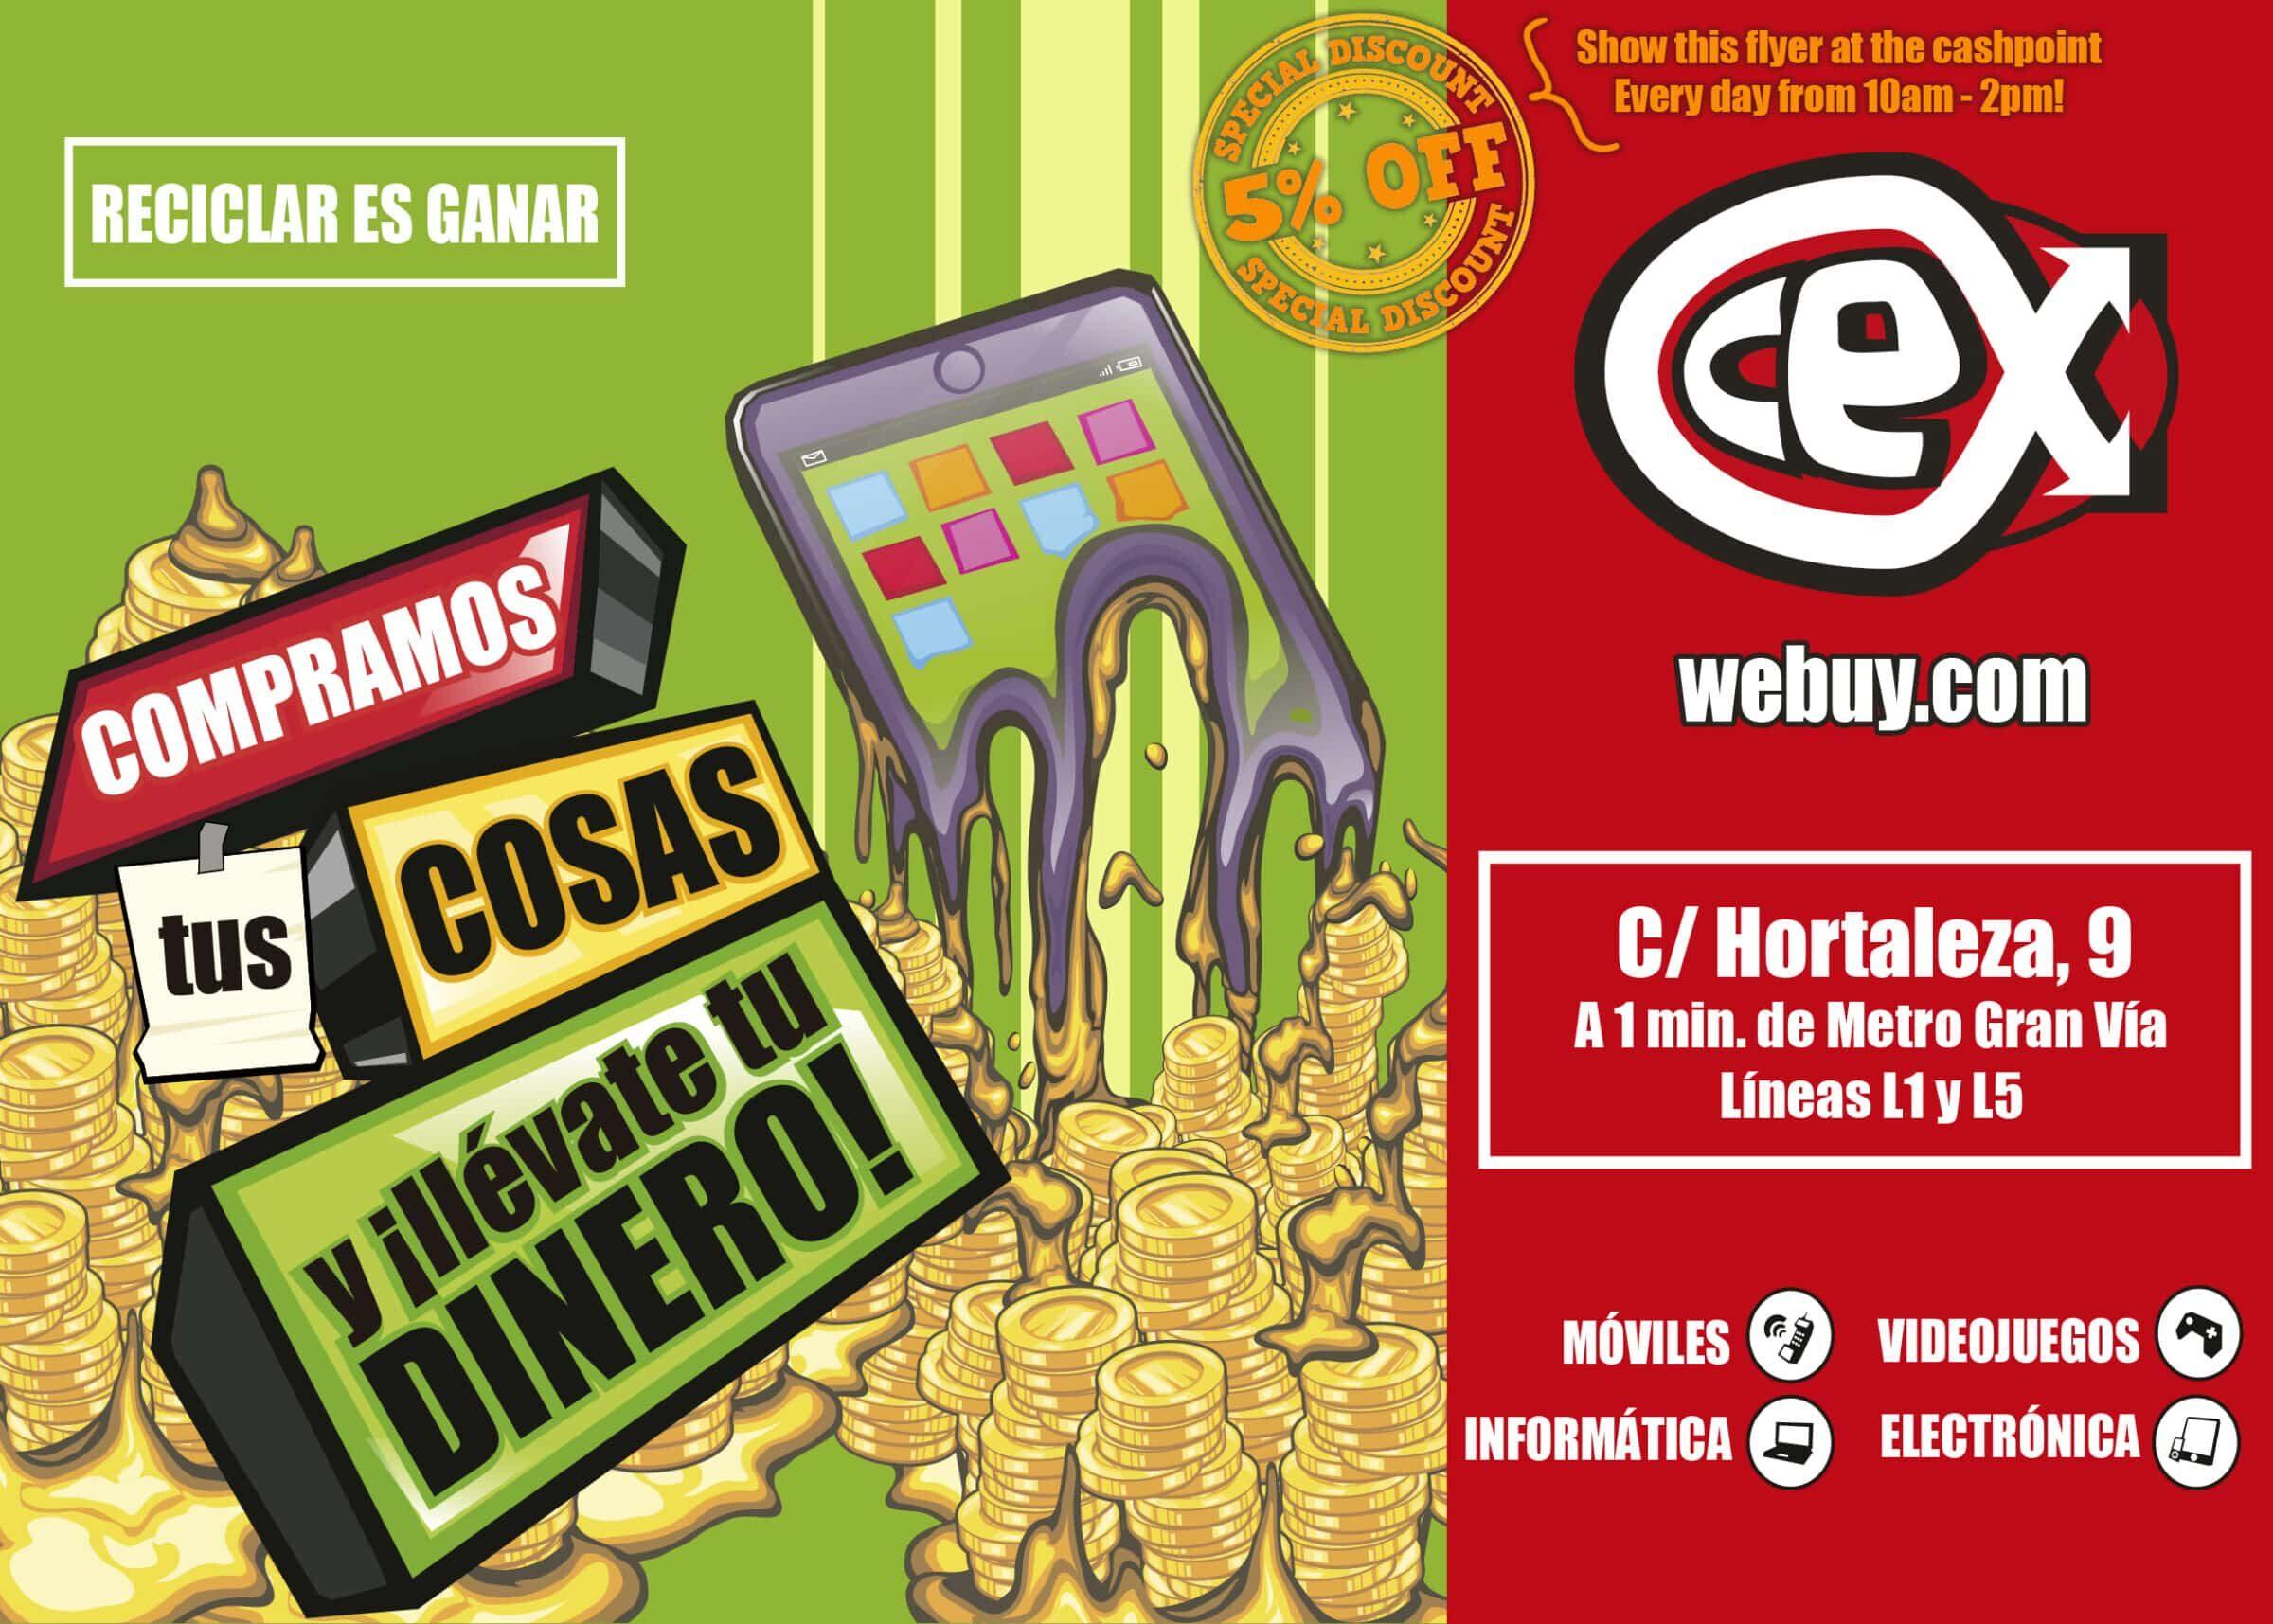 ES Madrid Hortaleza Ad w210mm x h150mm 180516 UNCVT FS